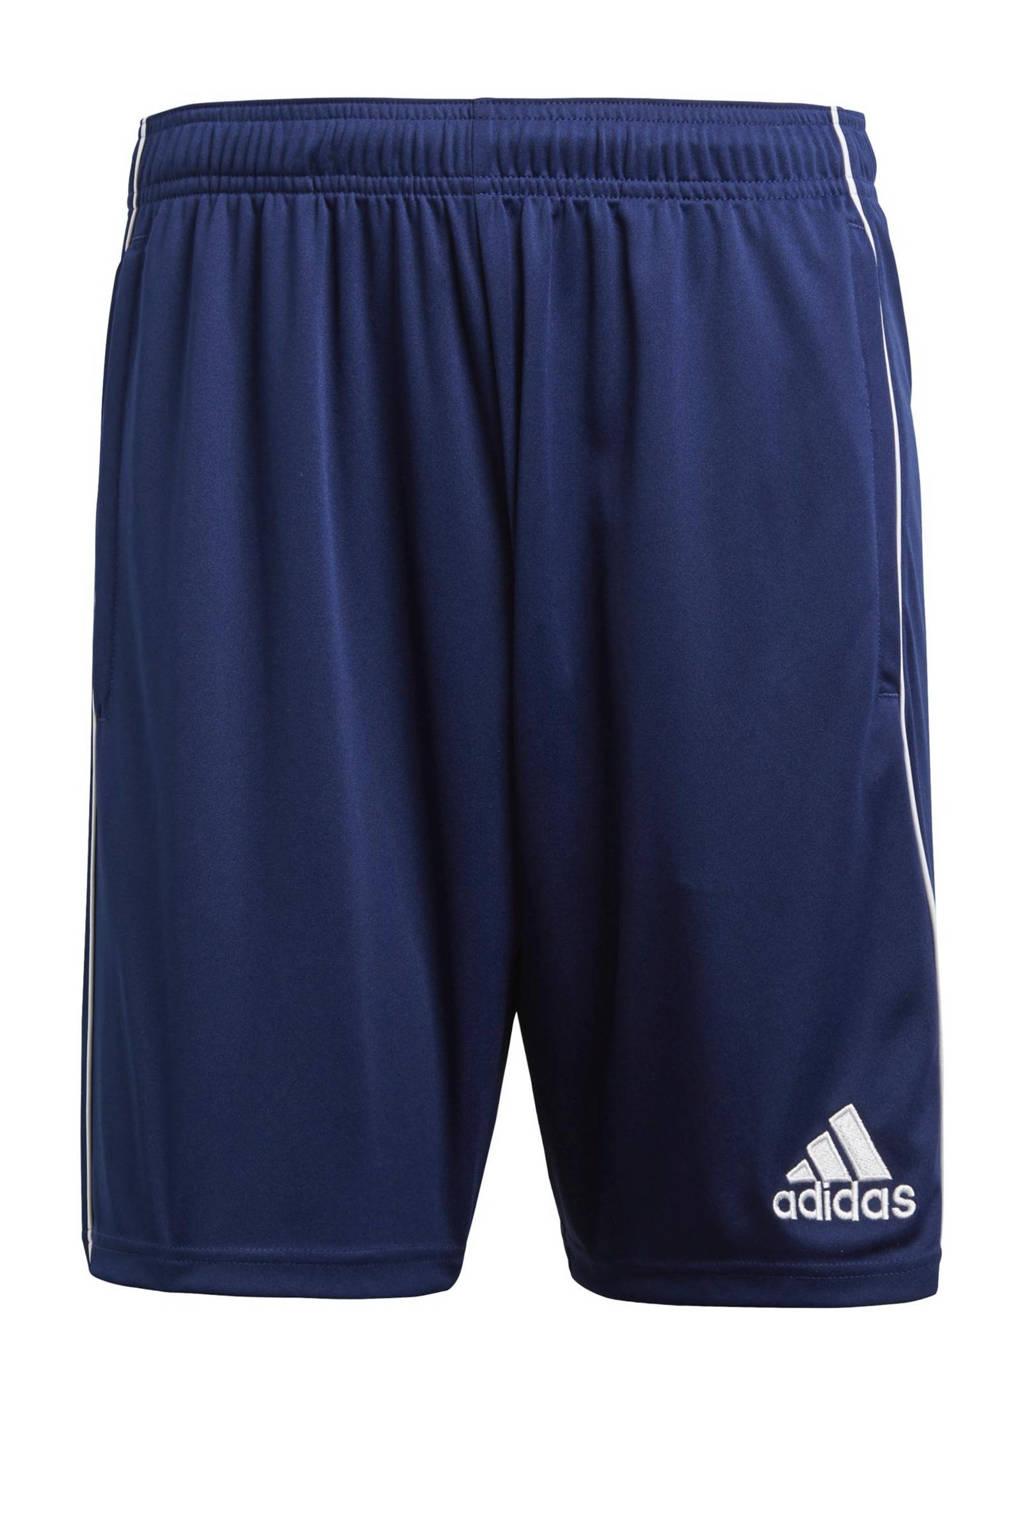 adidas   Core 18 sportshort donkerblauw, Donkerblauw/wit